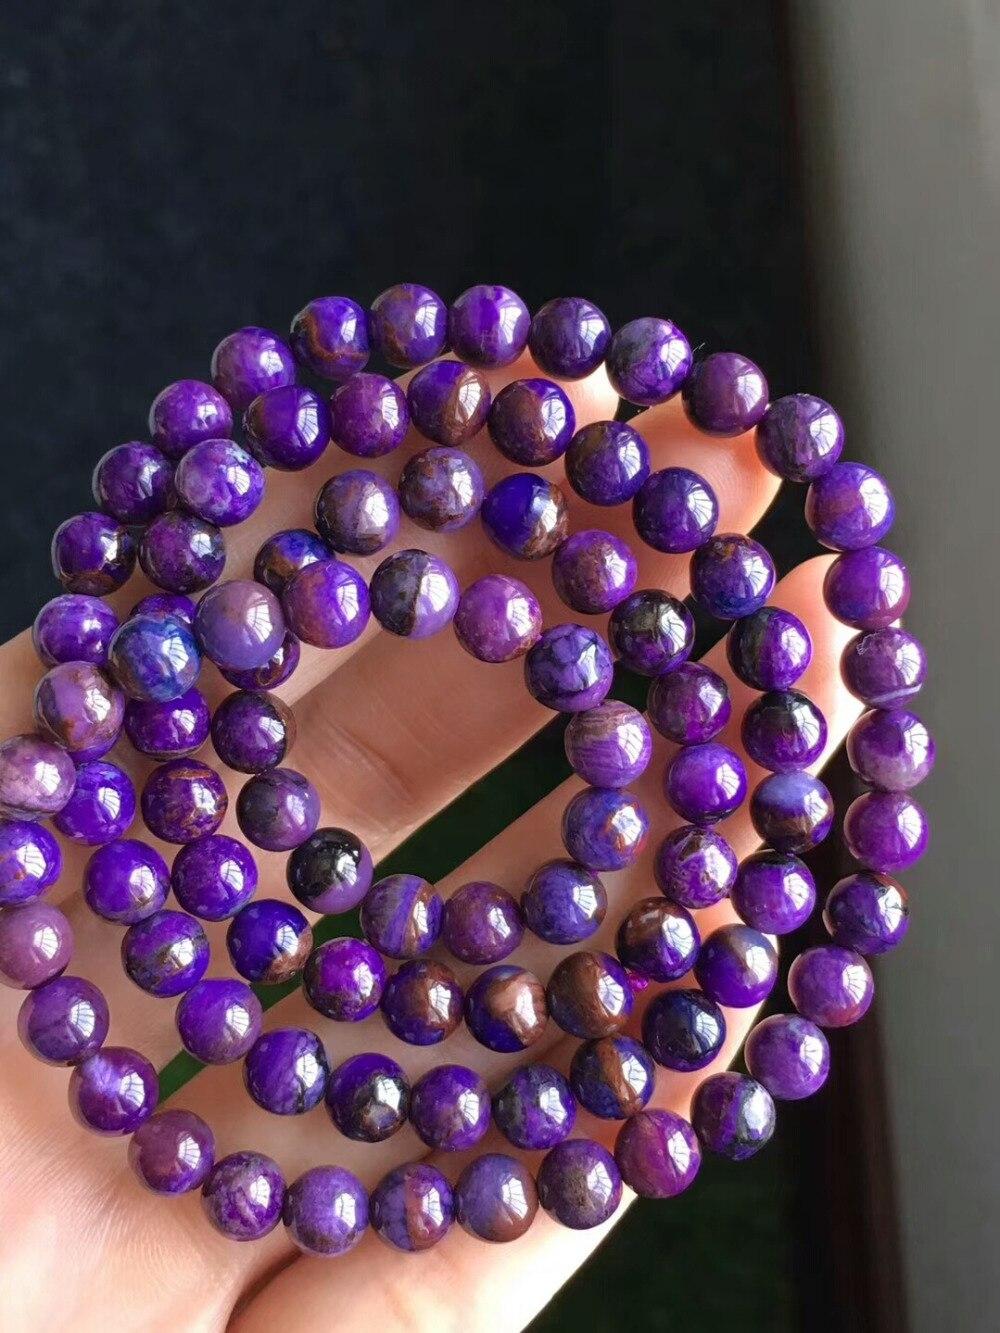 Genuine Natural Blue Purple Sugilite Gemstone Crystal Round Bead Stretch Bracelet 6.5mm Women Femme Charms Bracelet AAAAAGenuine Natural Blue Purple Sugilite Gemstone Crystal Round Bead Stretch Bracelet 6.5mm Women Femme Charms Bracelet AAAAA